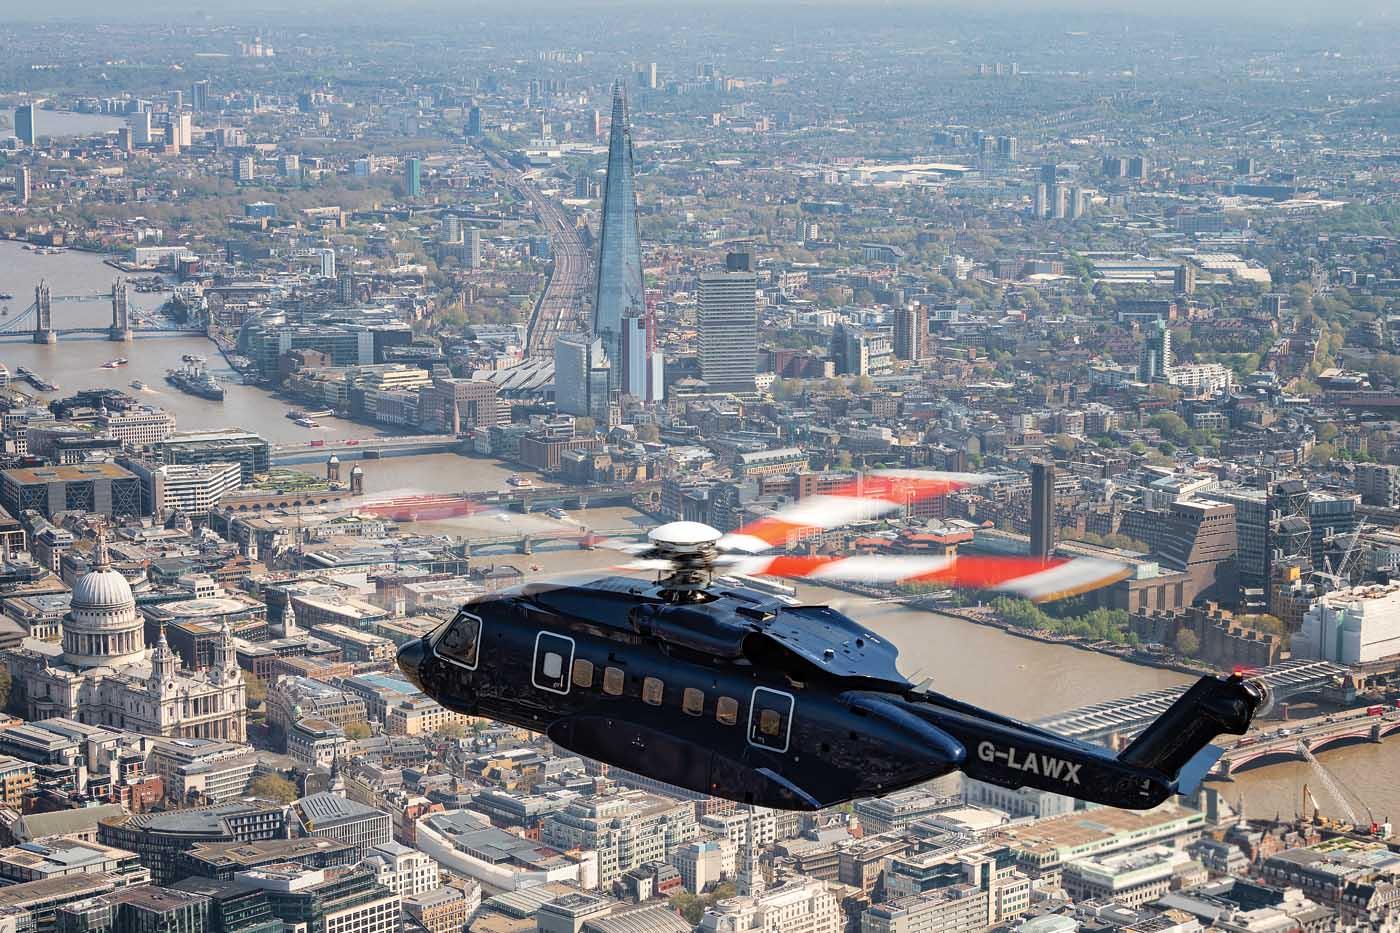 Starspeed's unique VIP Sikorsky S-92 flying through the heli lanes in London, U.K. Lloyd Horgan Photo